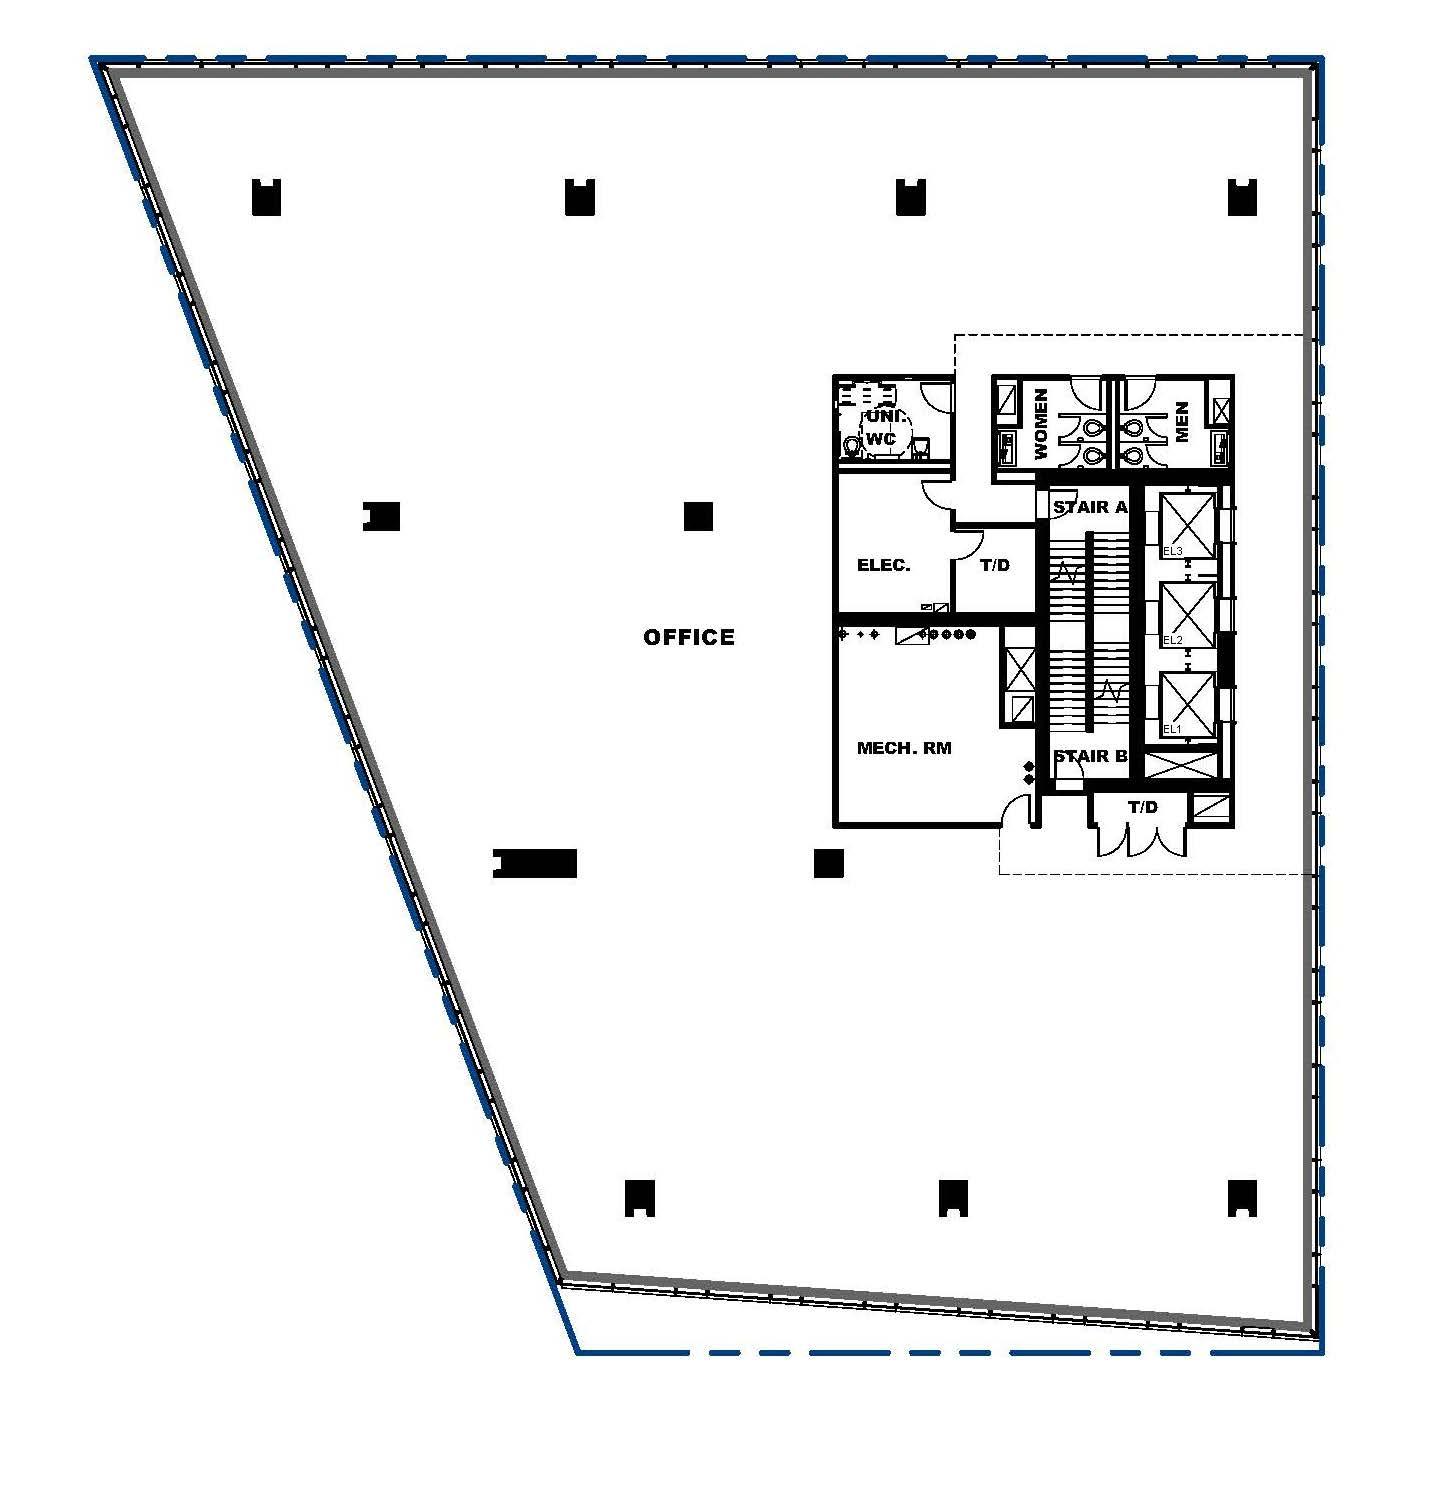 Floorplan thumbnail of The Exchange - 7th floor